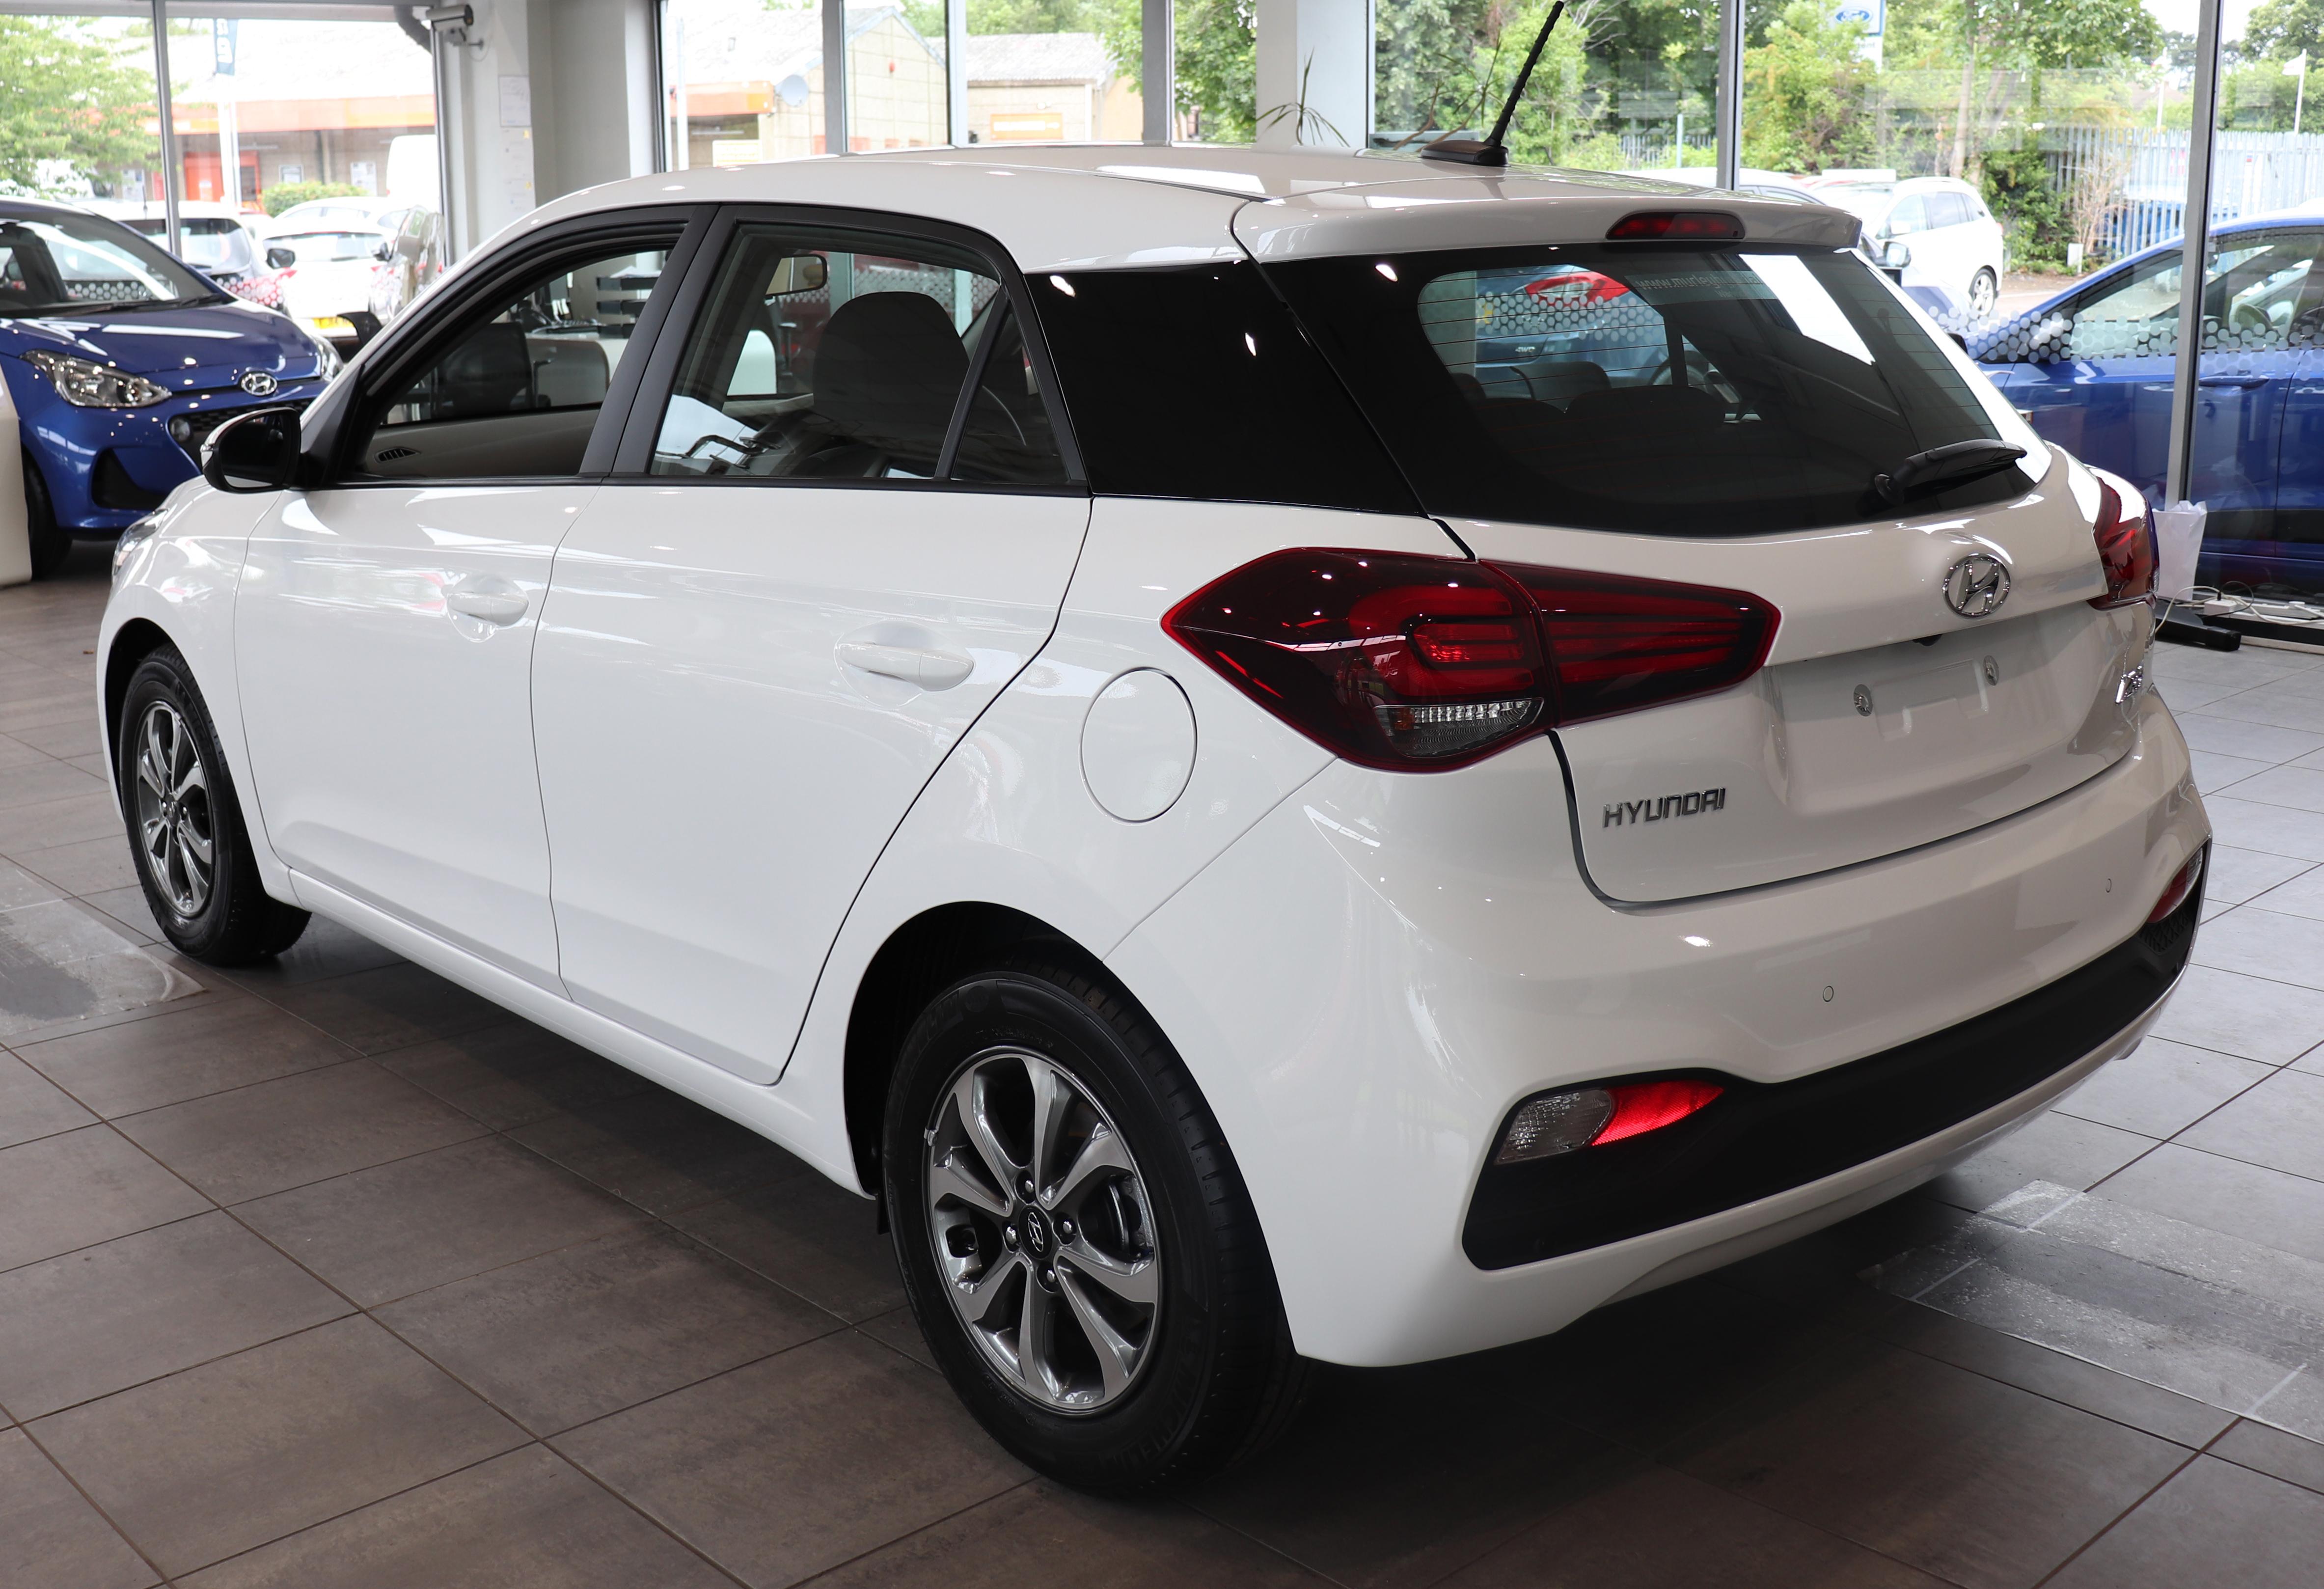 Datei:2018 Hyundai i20 facelift Rear.jpg – Wikipedia